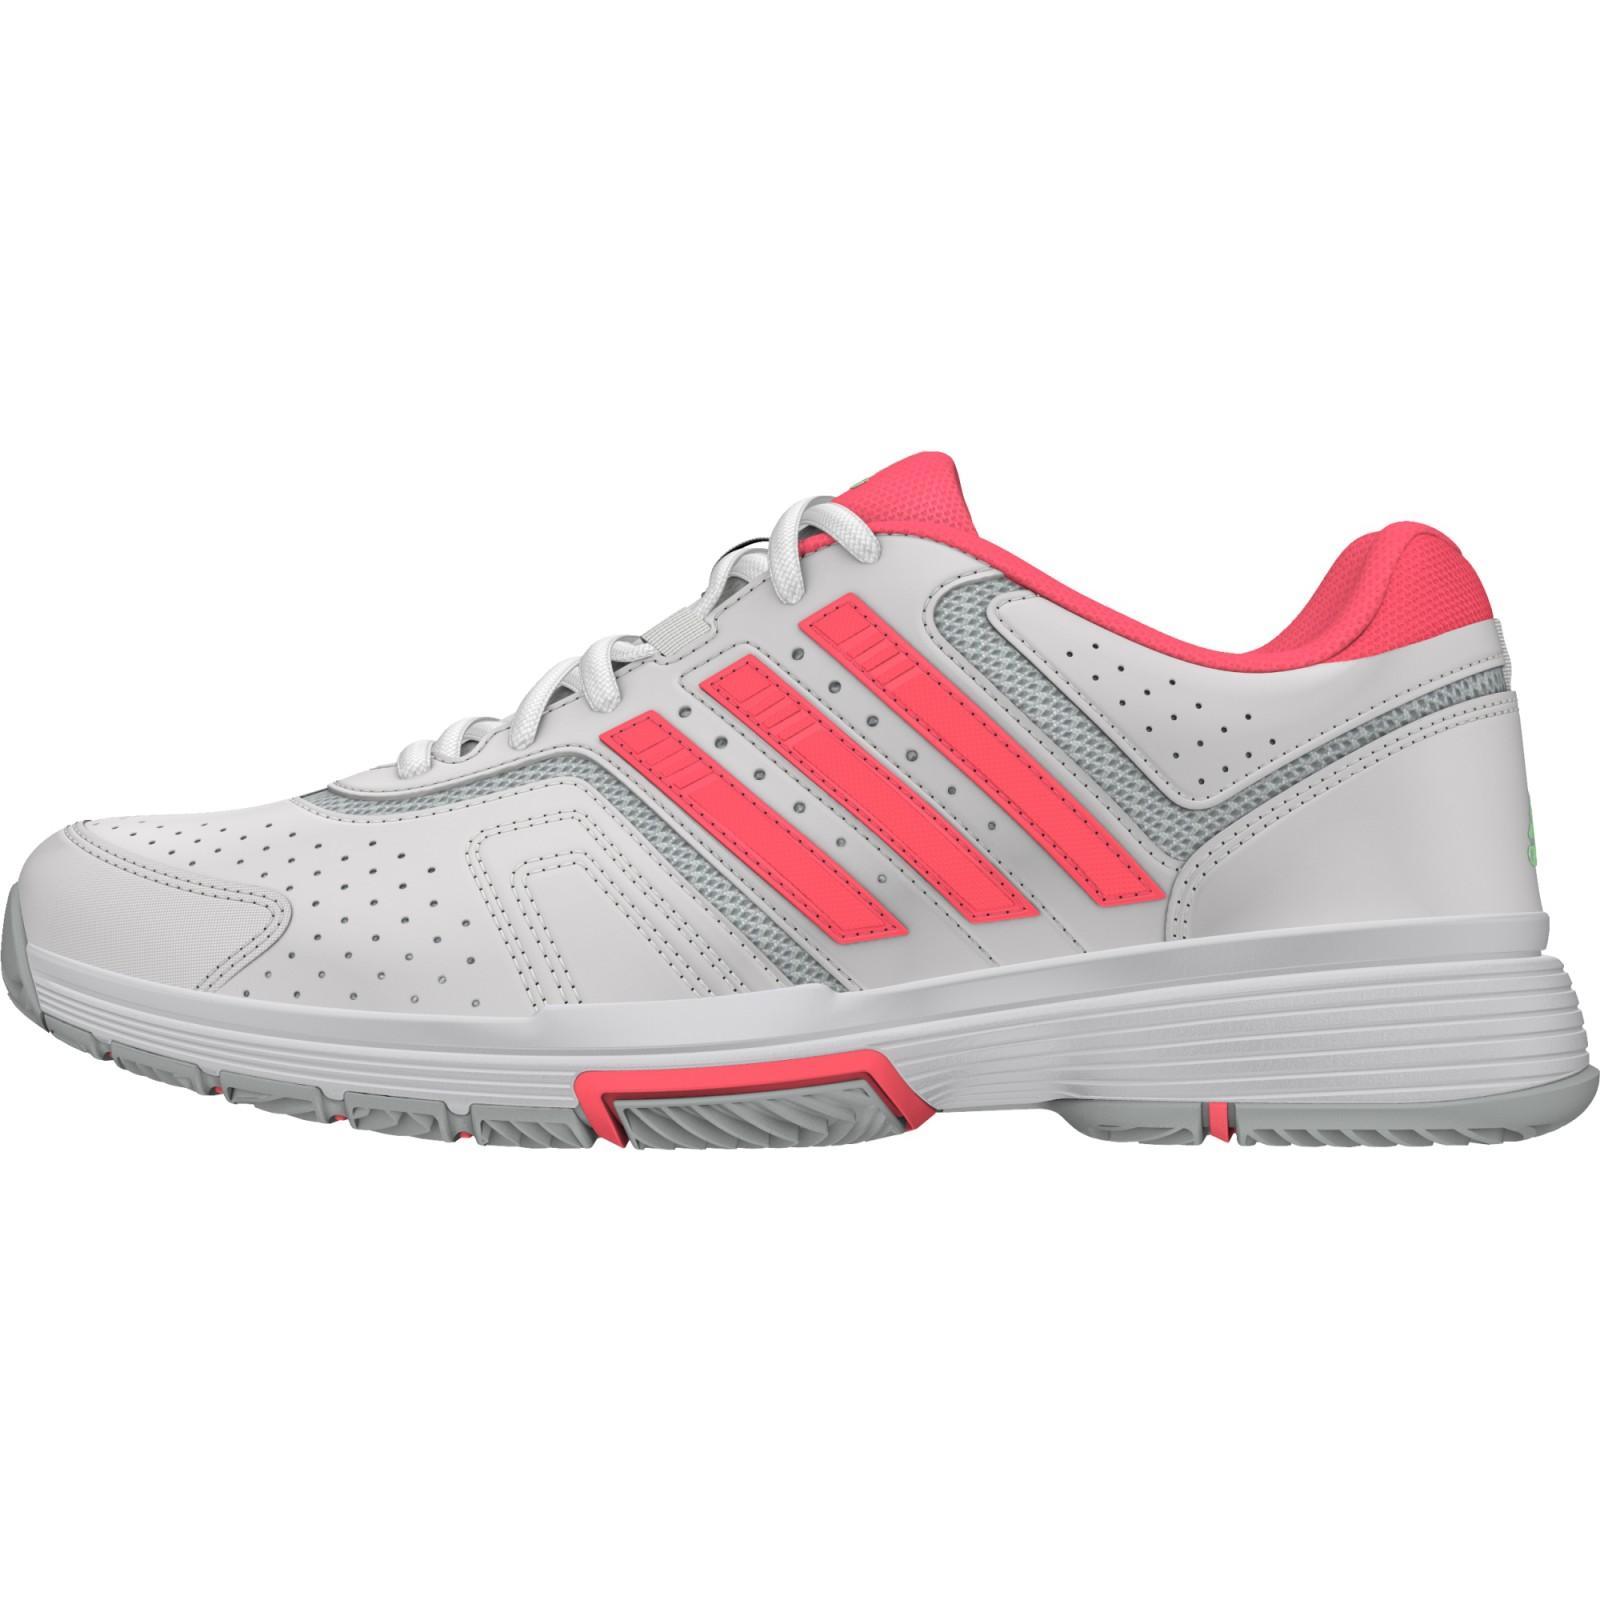 Dámské tenisové boty adidas barricade court w  f5e678b5ef